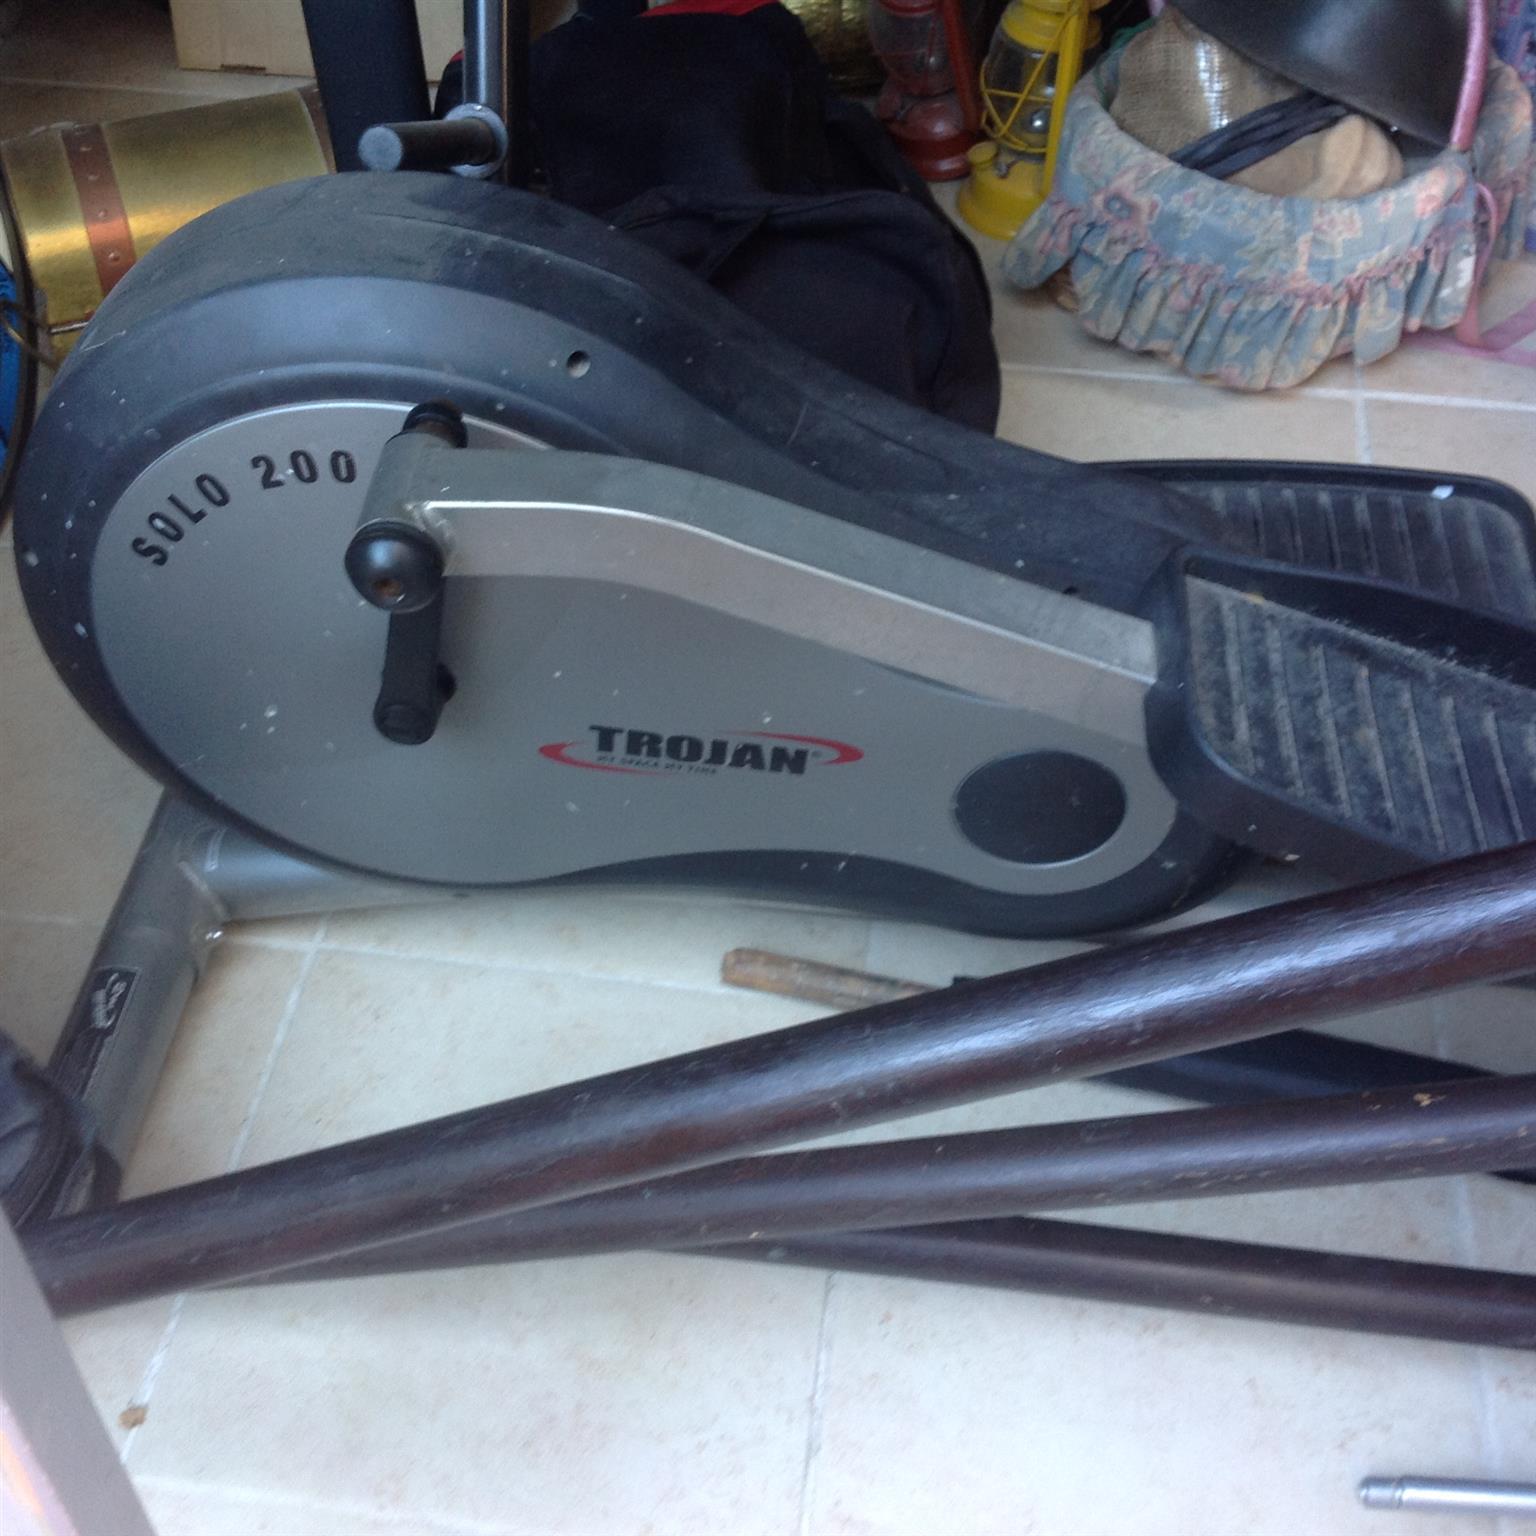 Trojan cycling gym and punching bag